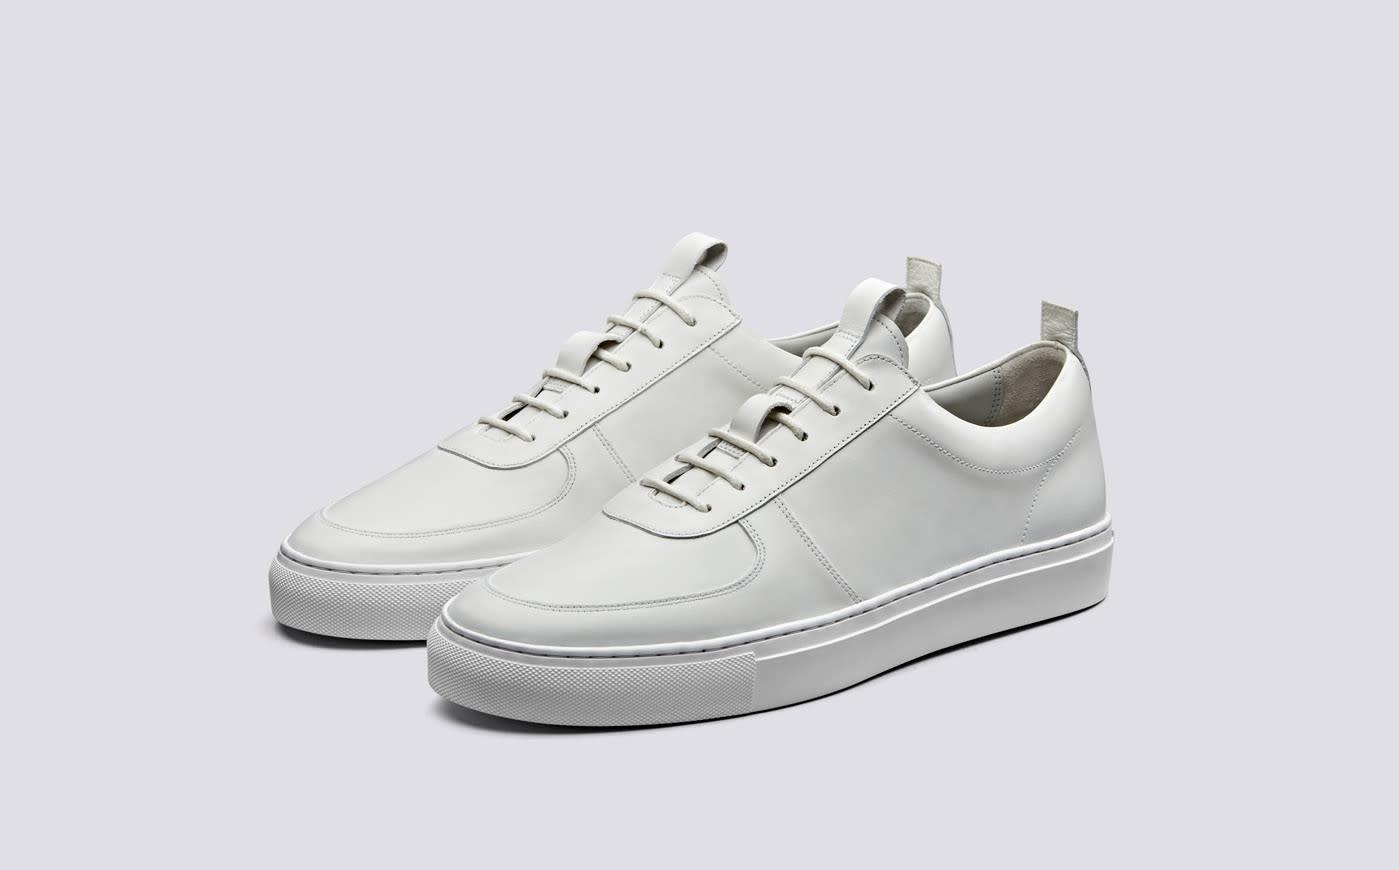 Sneaker 22 White Calf Leather-1